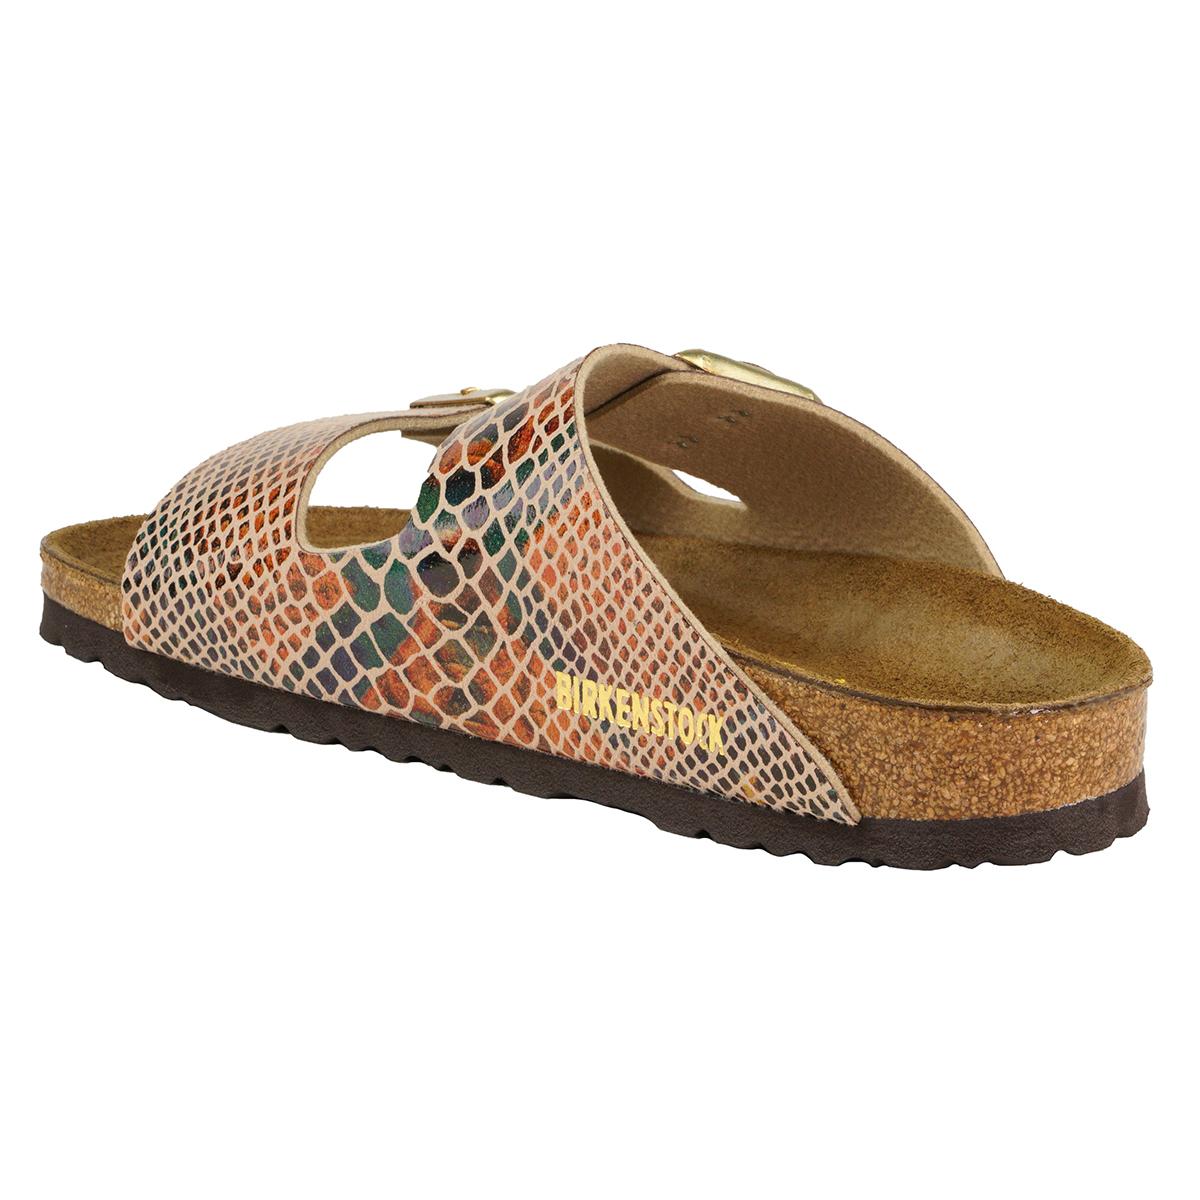 Birkenstock-Arizona-Sandals thumbnail 49